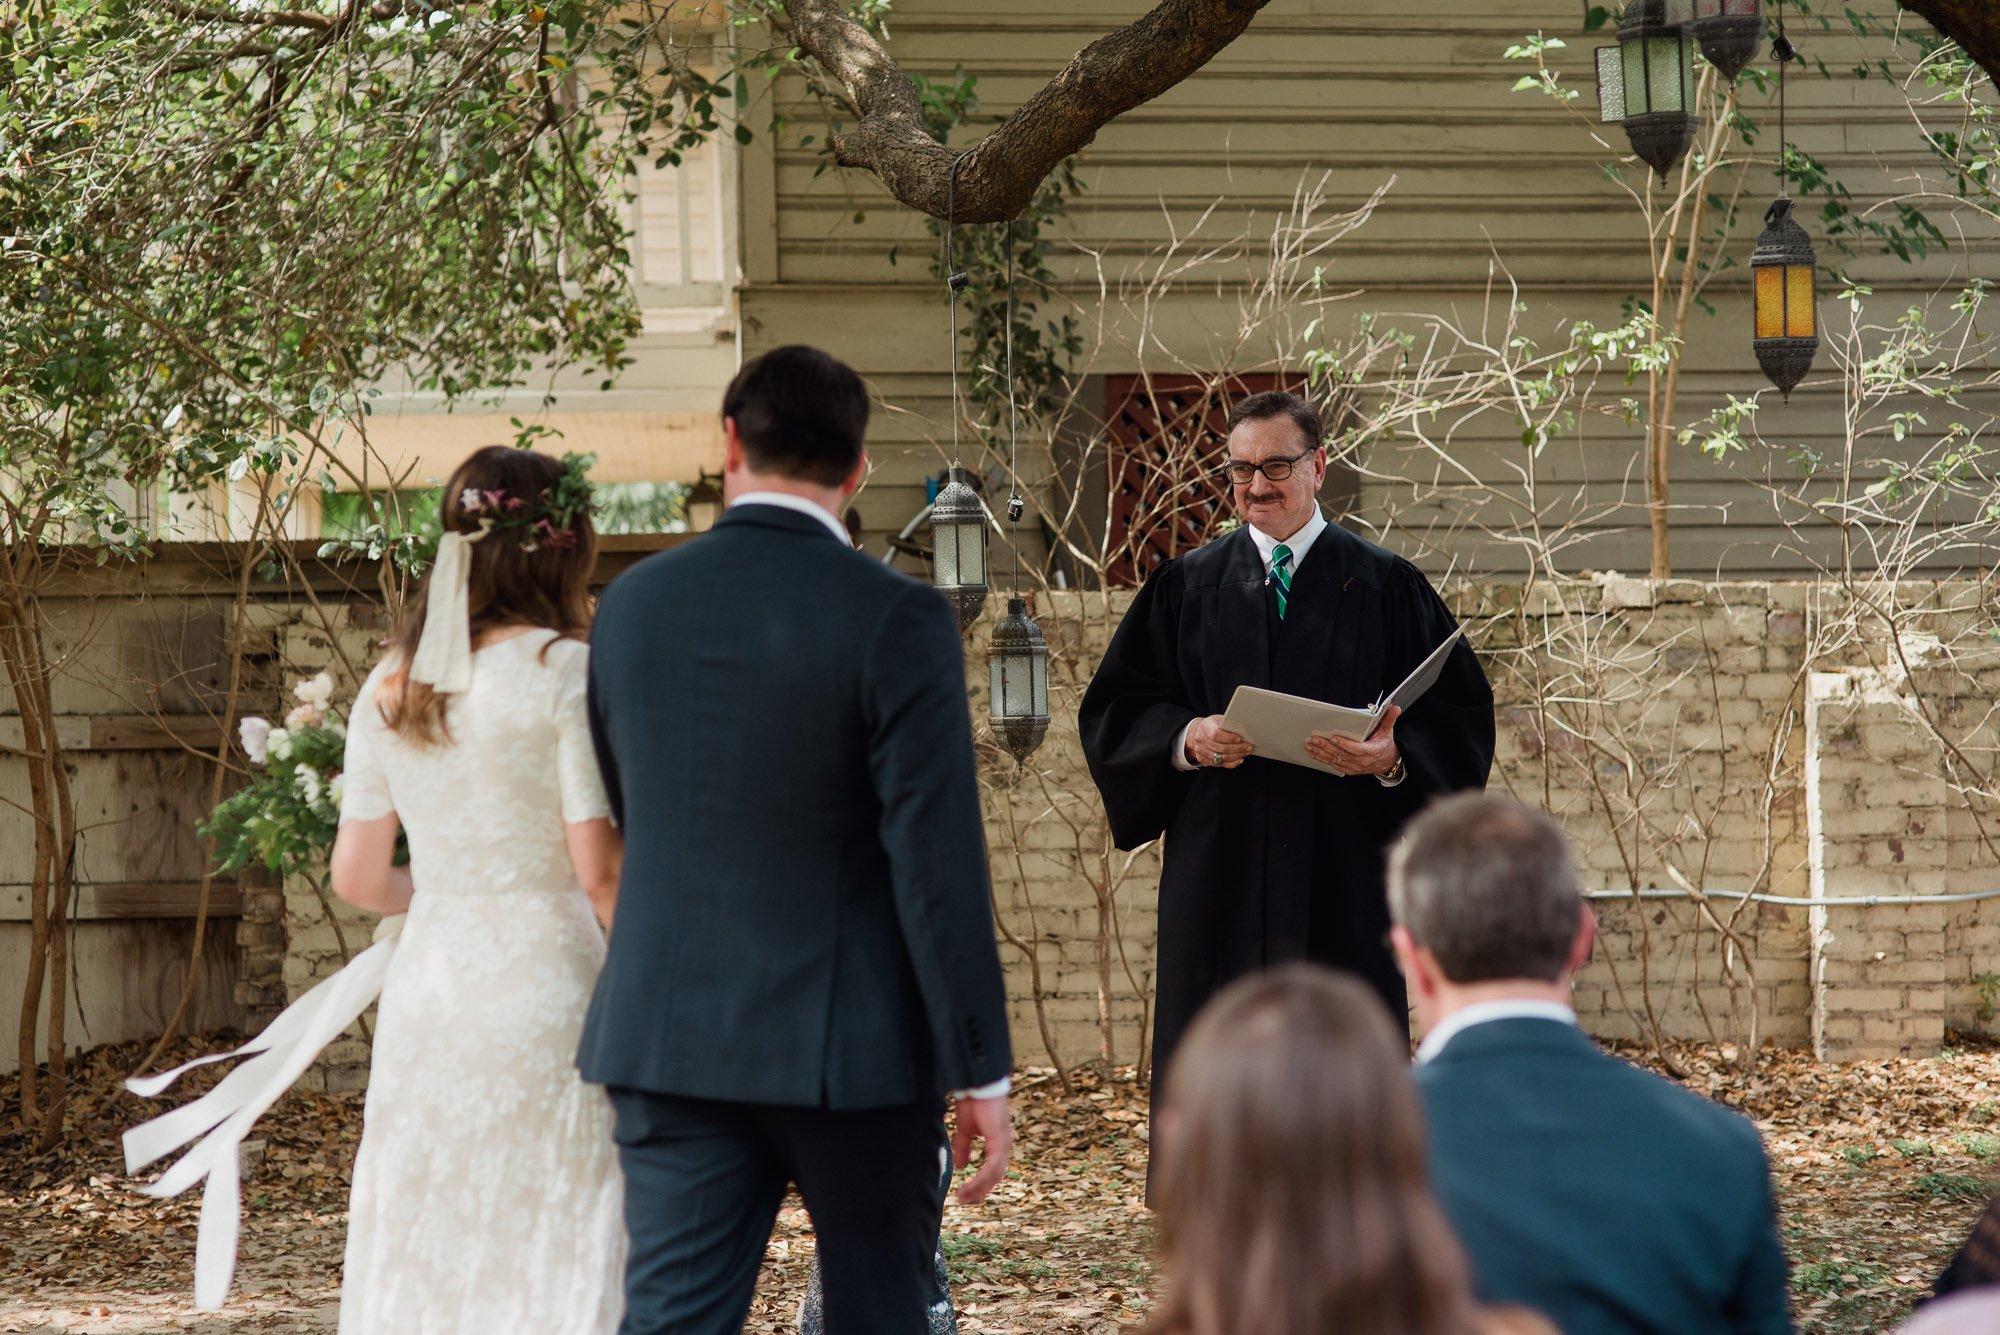 backyard wedding at king william manor in san antonio, san antonio wedding photography, san antonio wedding photographer